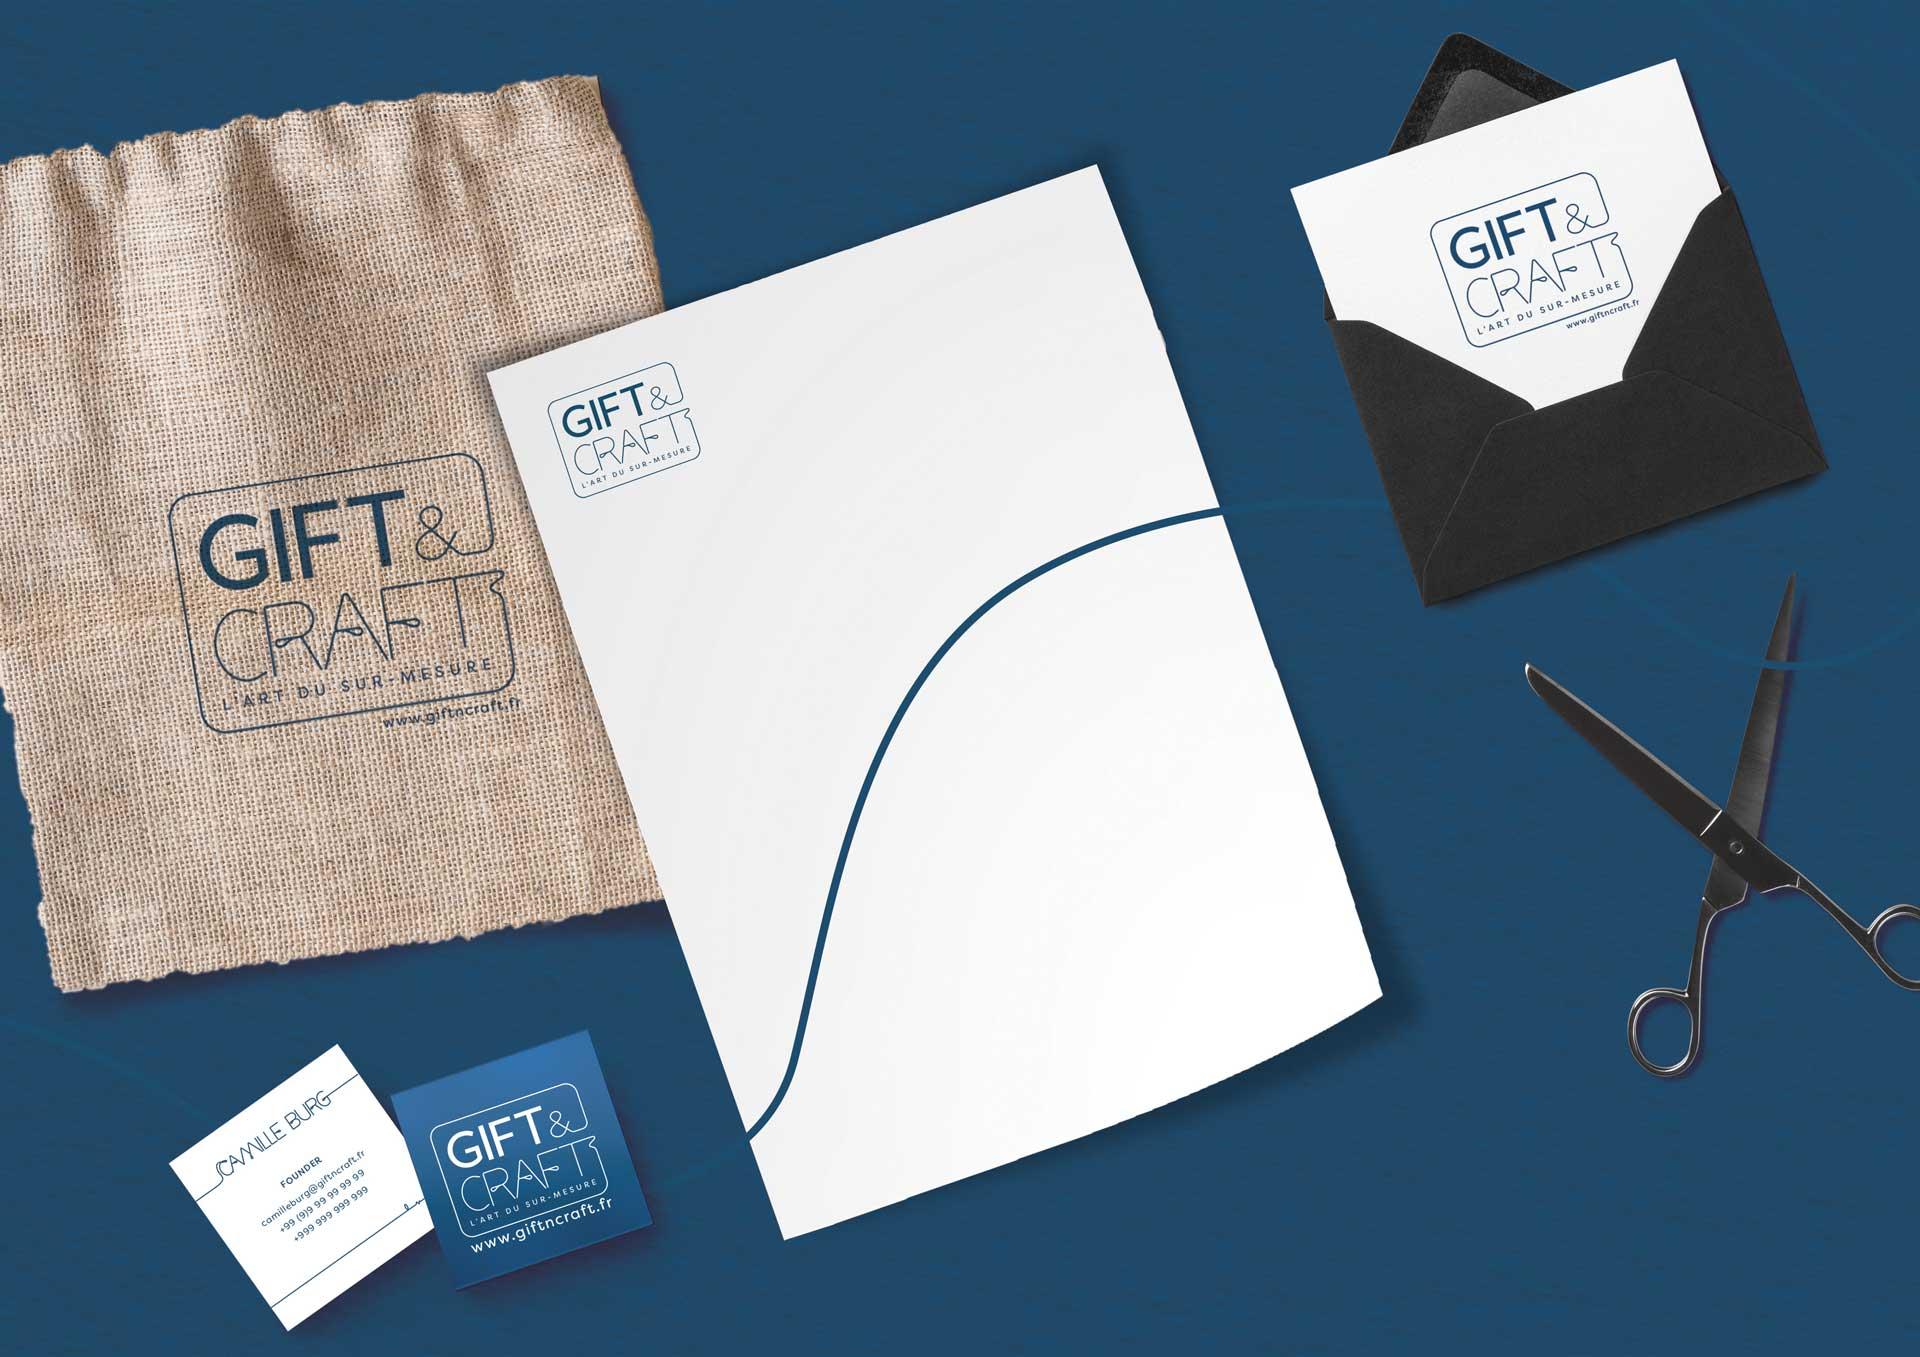 Elixir Design - Gift & Craft 1